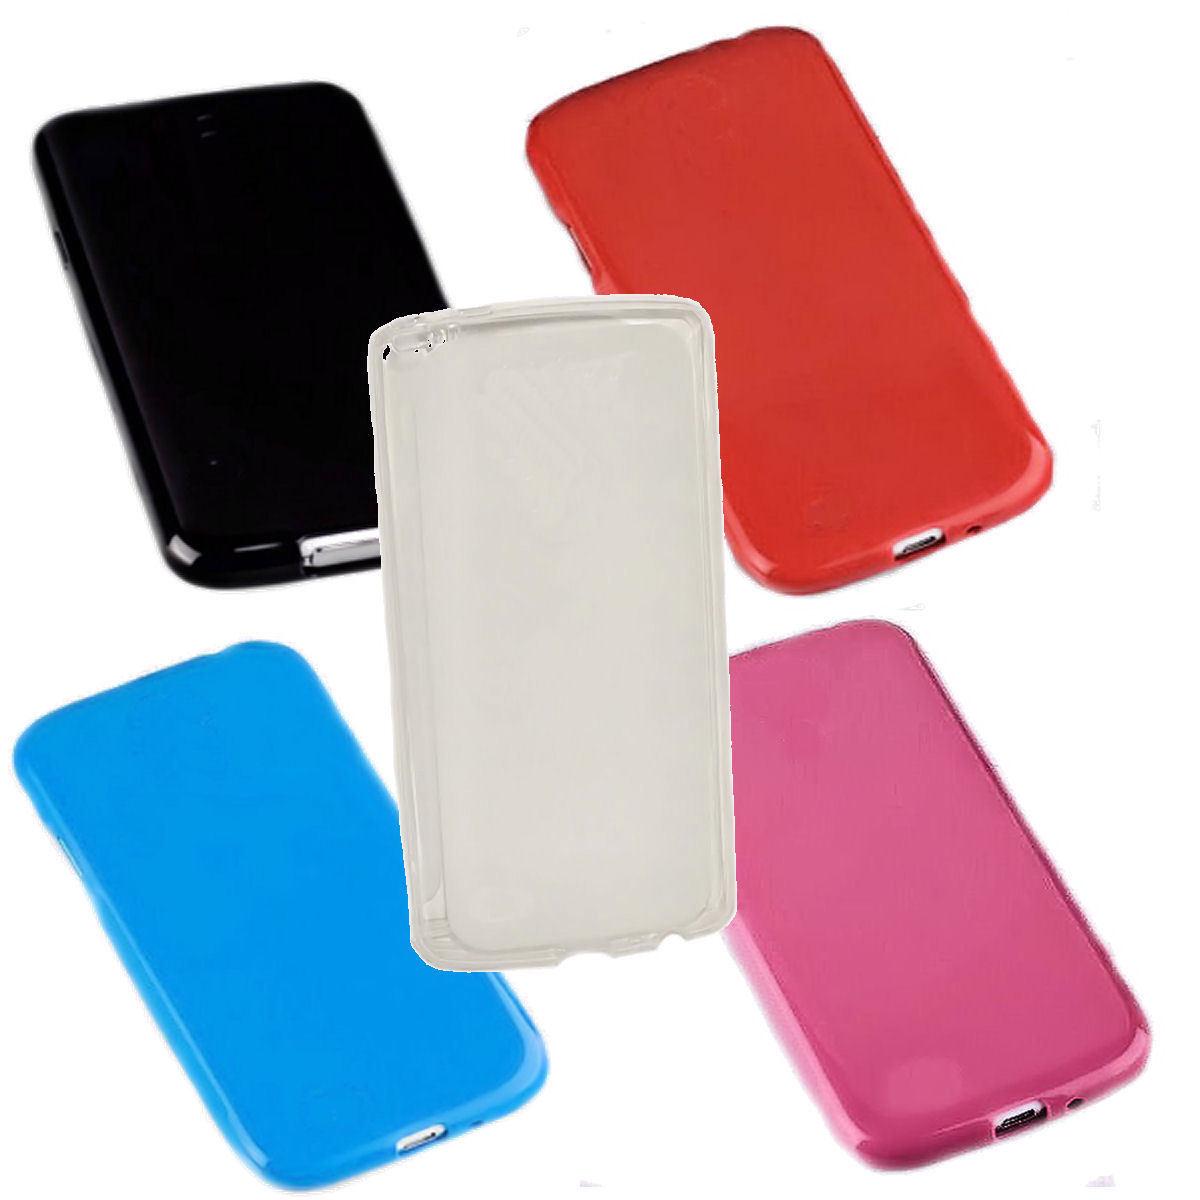 Dark Case Silikon TPU Handy Cover Hülle Kappe Schale Schutzhülle   -   Auswahl 2